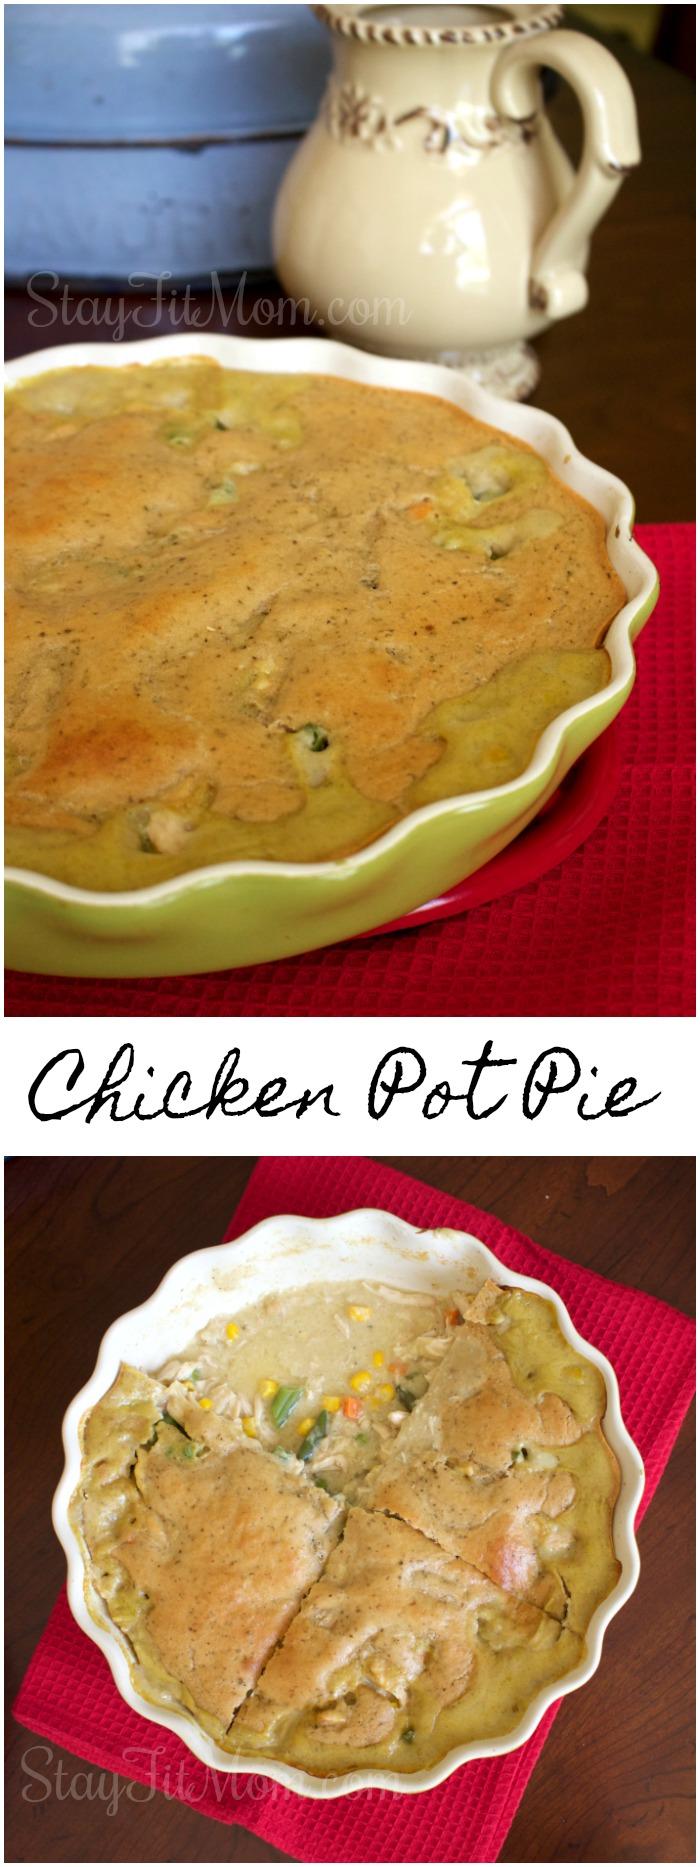 Kodiak Cakes Pancake Mix makes for a great, low fat, Chicken Pot Pie!